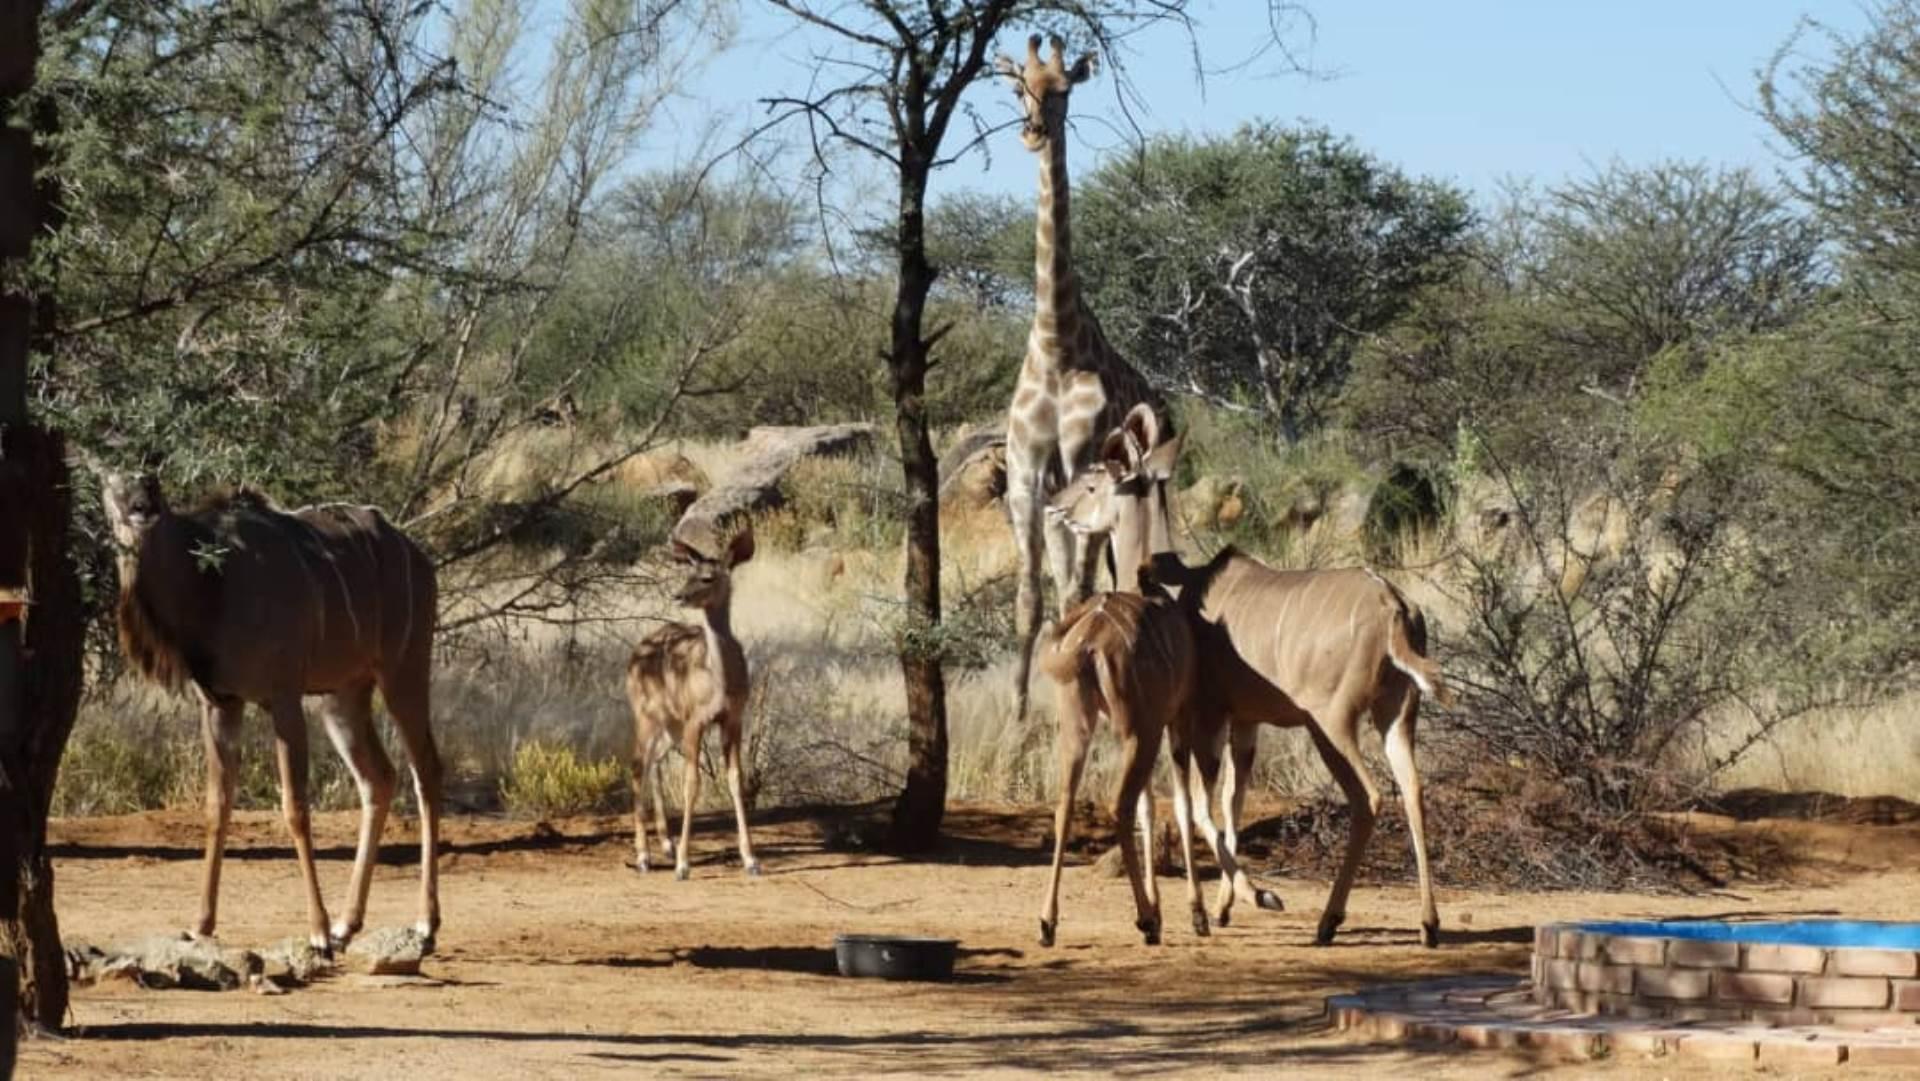 Small Holding For Sale In Omaruru Omaruru Namibia For